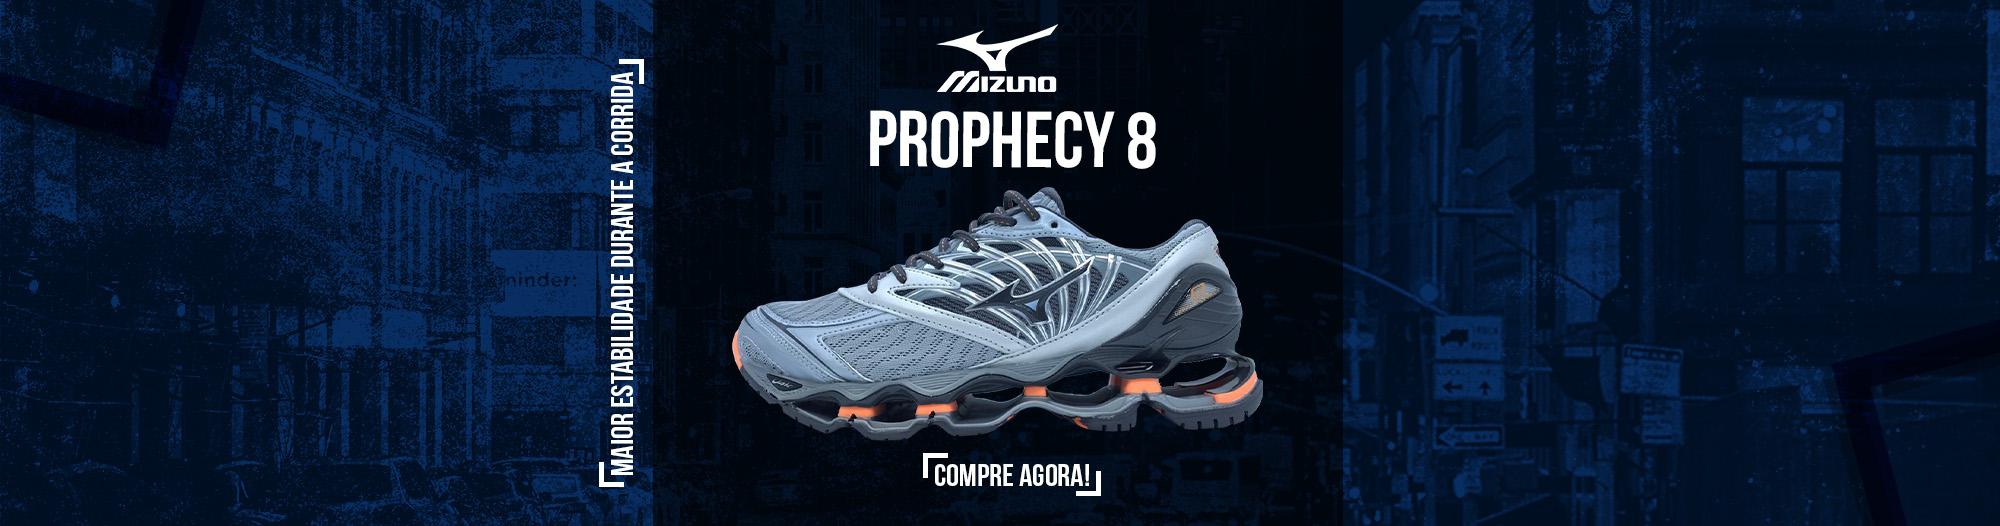 prophecy 8 - Azul escuro